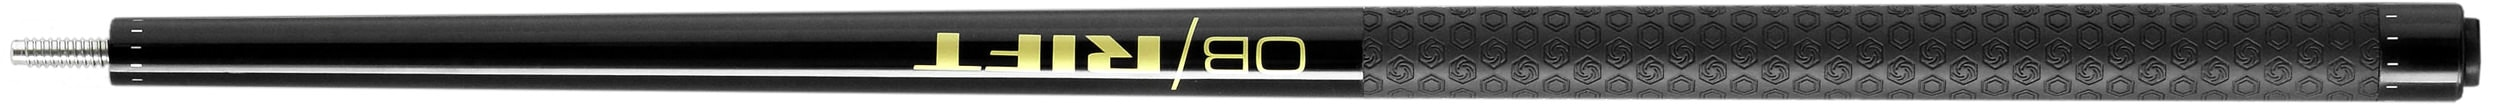 obブレイク キュー obrrb 黒 ラバーグリップ 商品画像